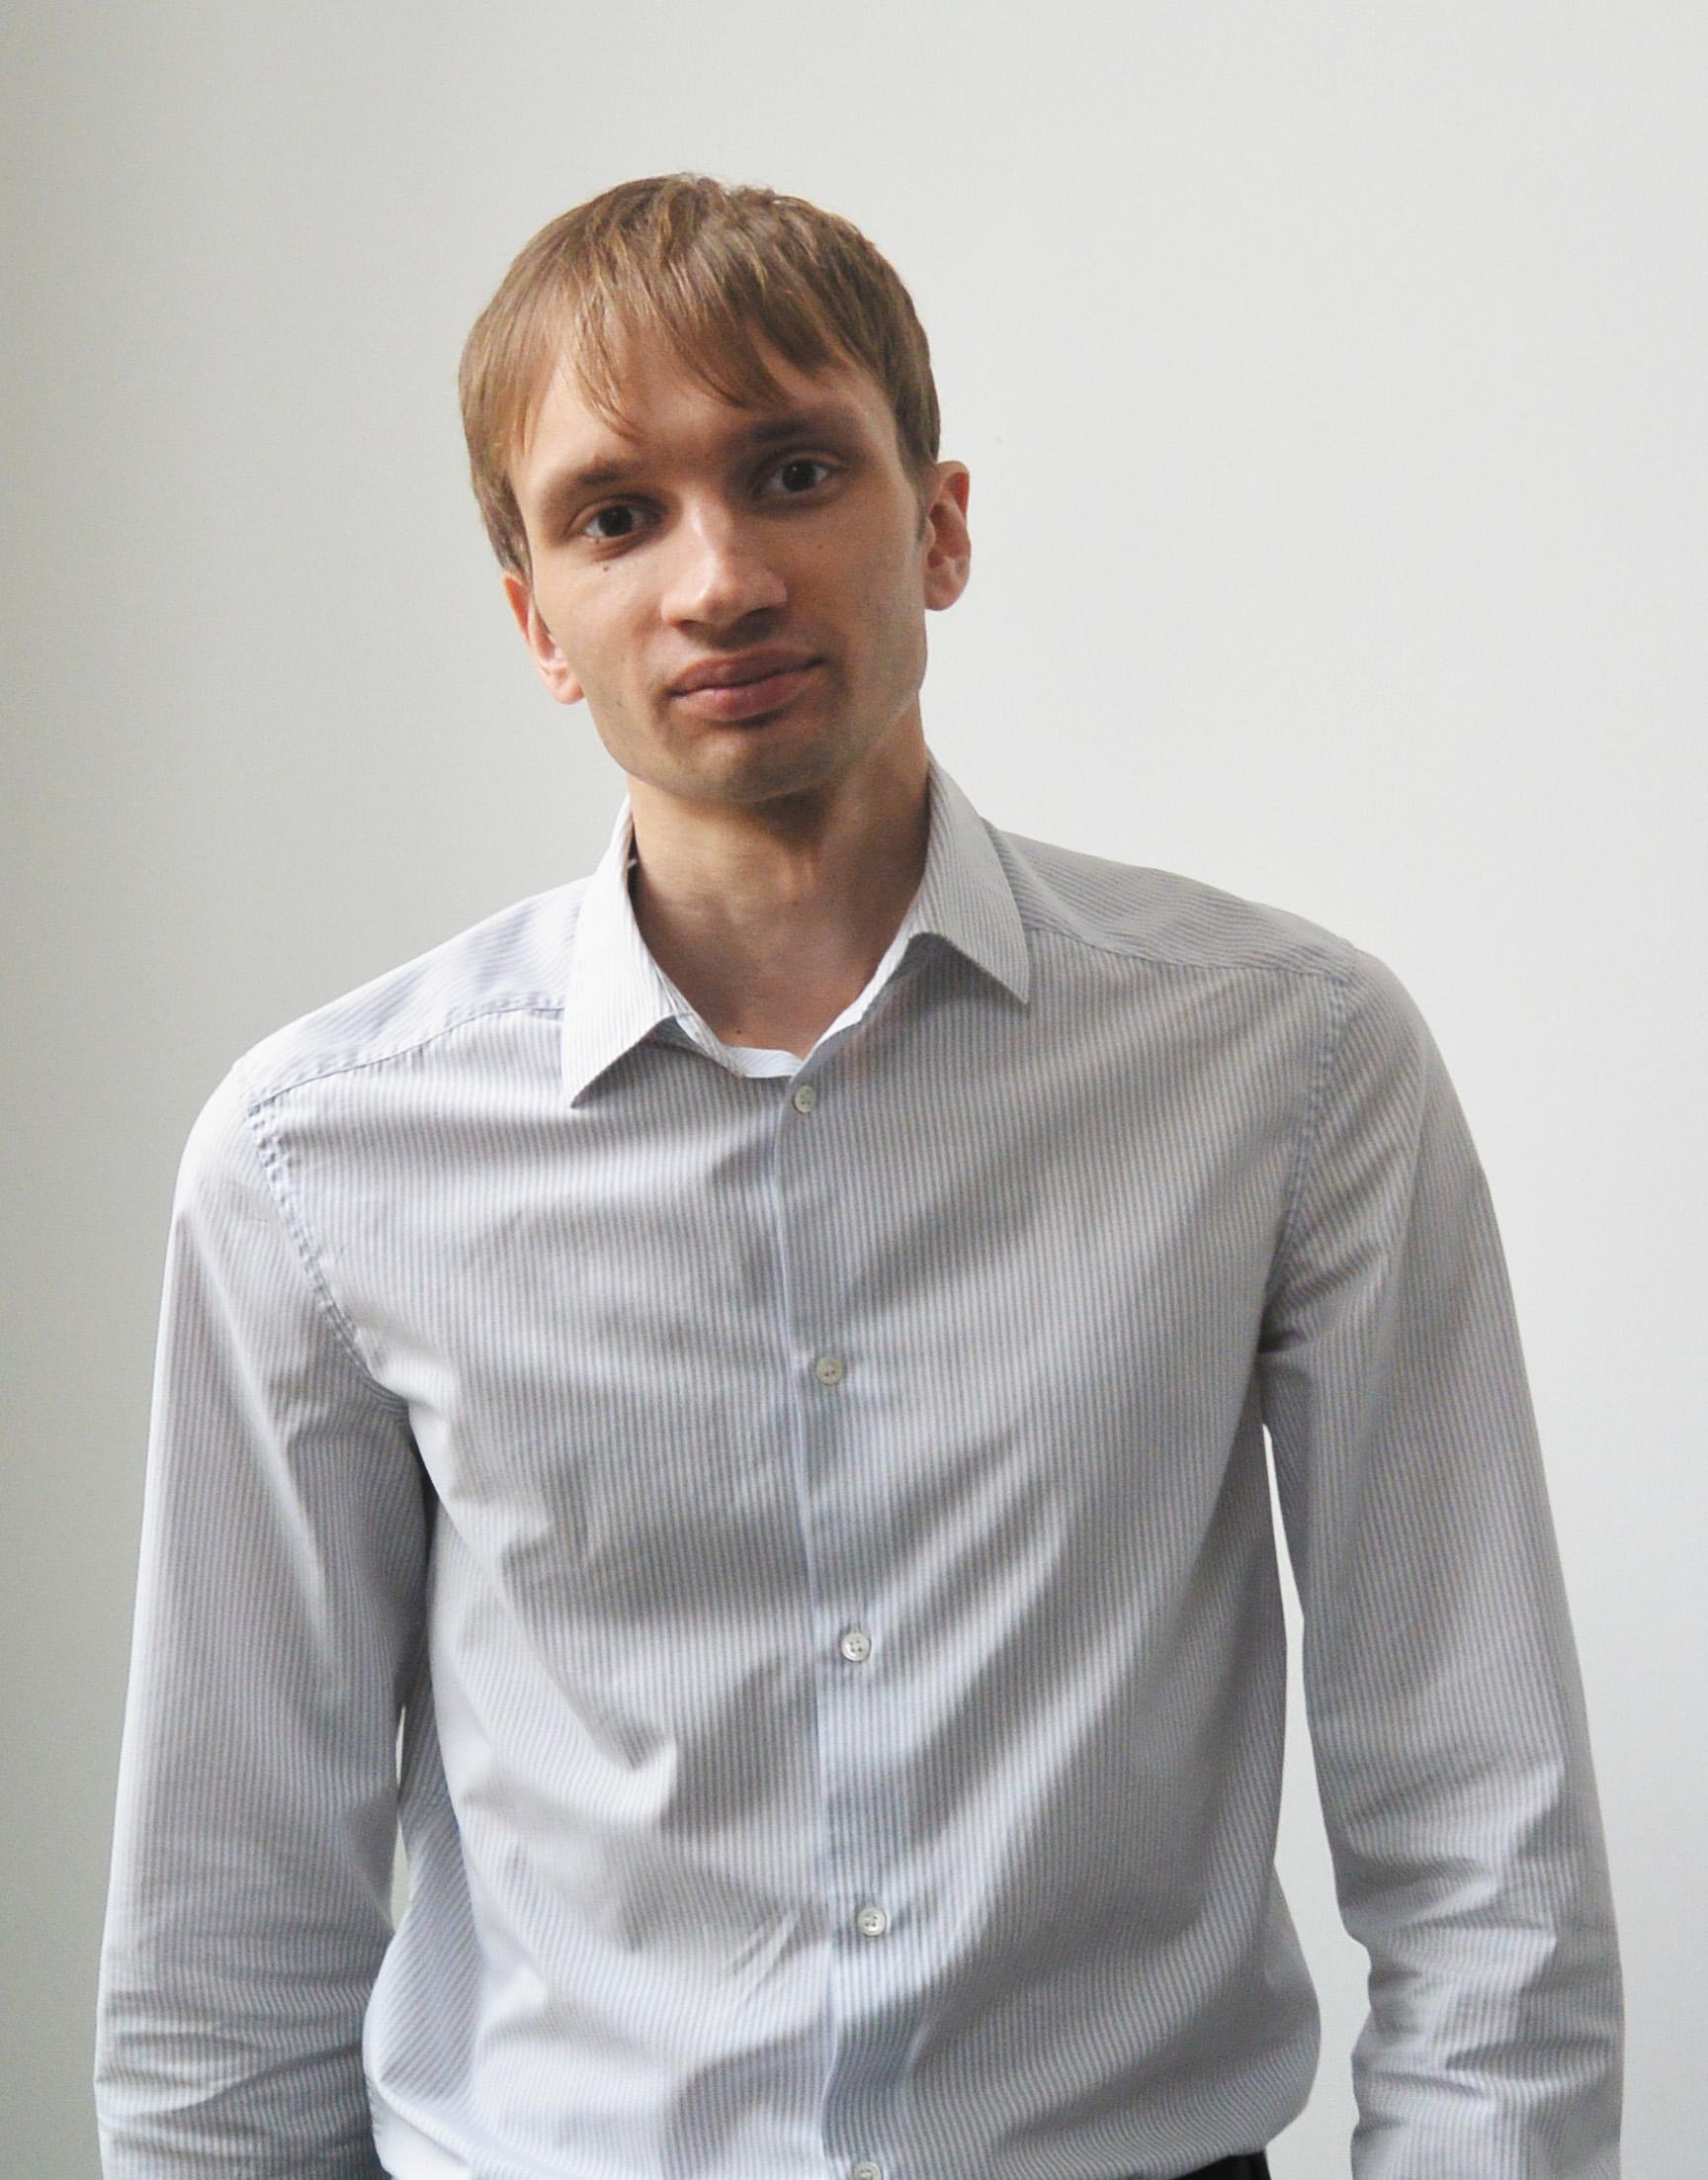 Дмитрий Васильев, ООО «ФЕСТО-РФ»